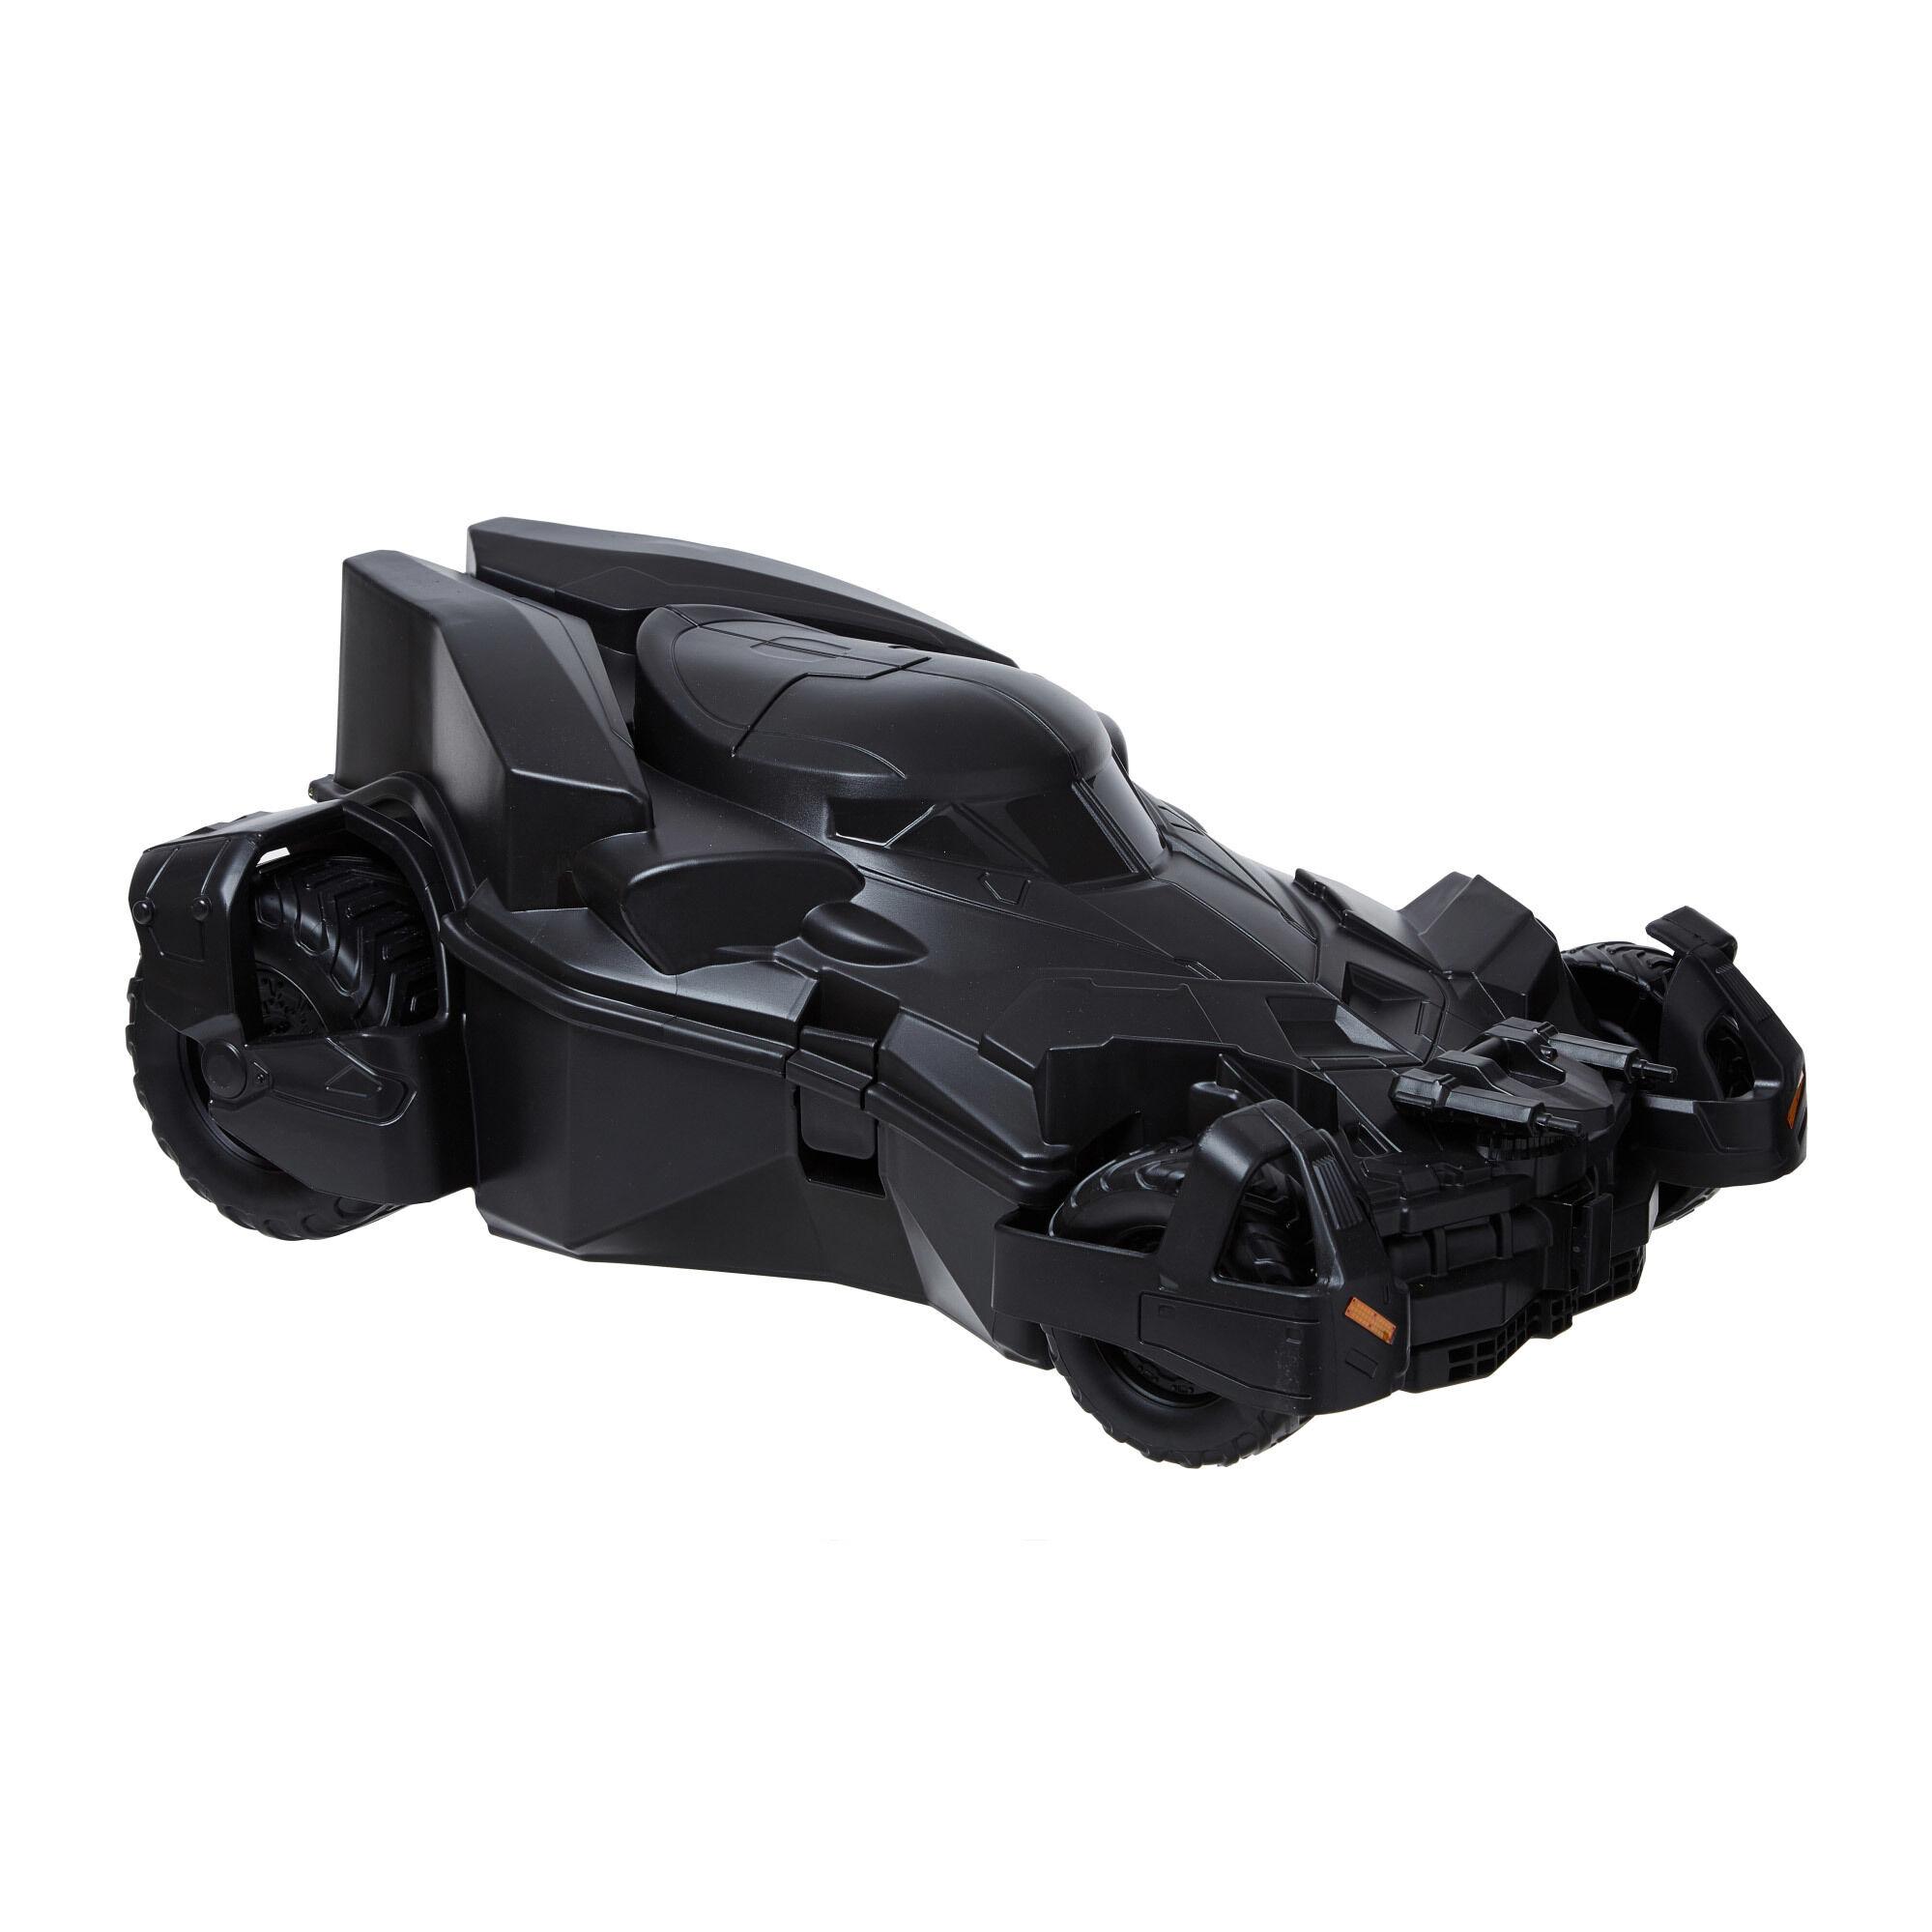 Lapin Accessories Βαλίτσα Αυτοκίνητο Batmobile